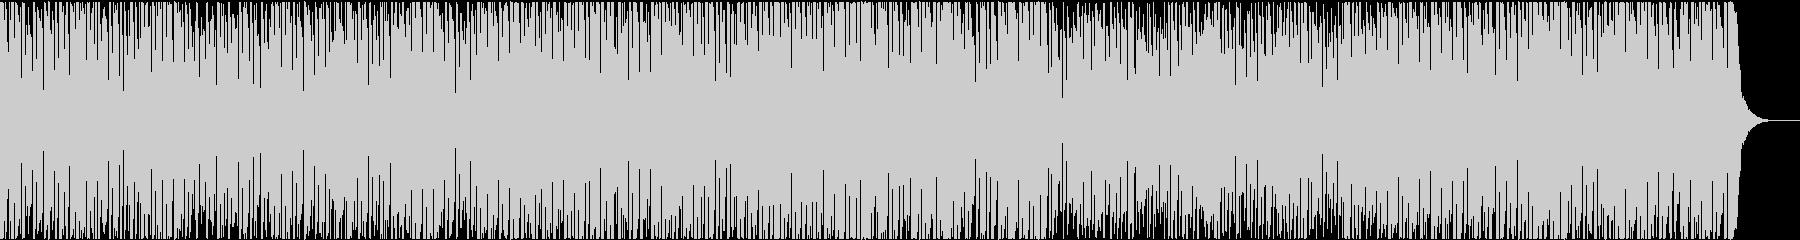 News6 24bit44kHzVerの未再生の波形